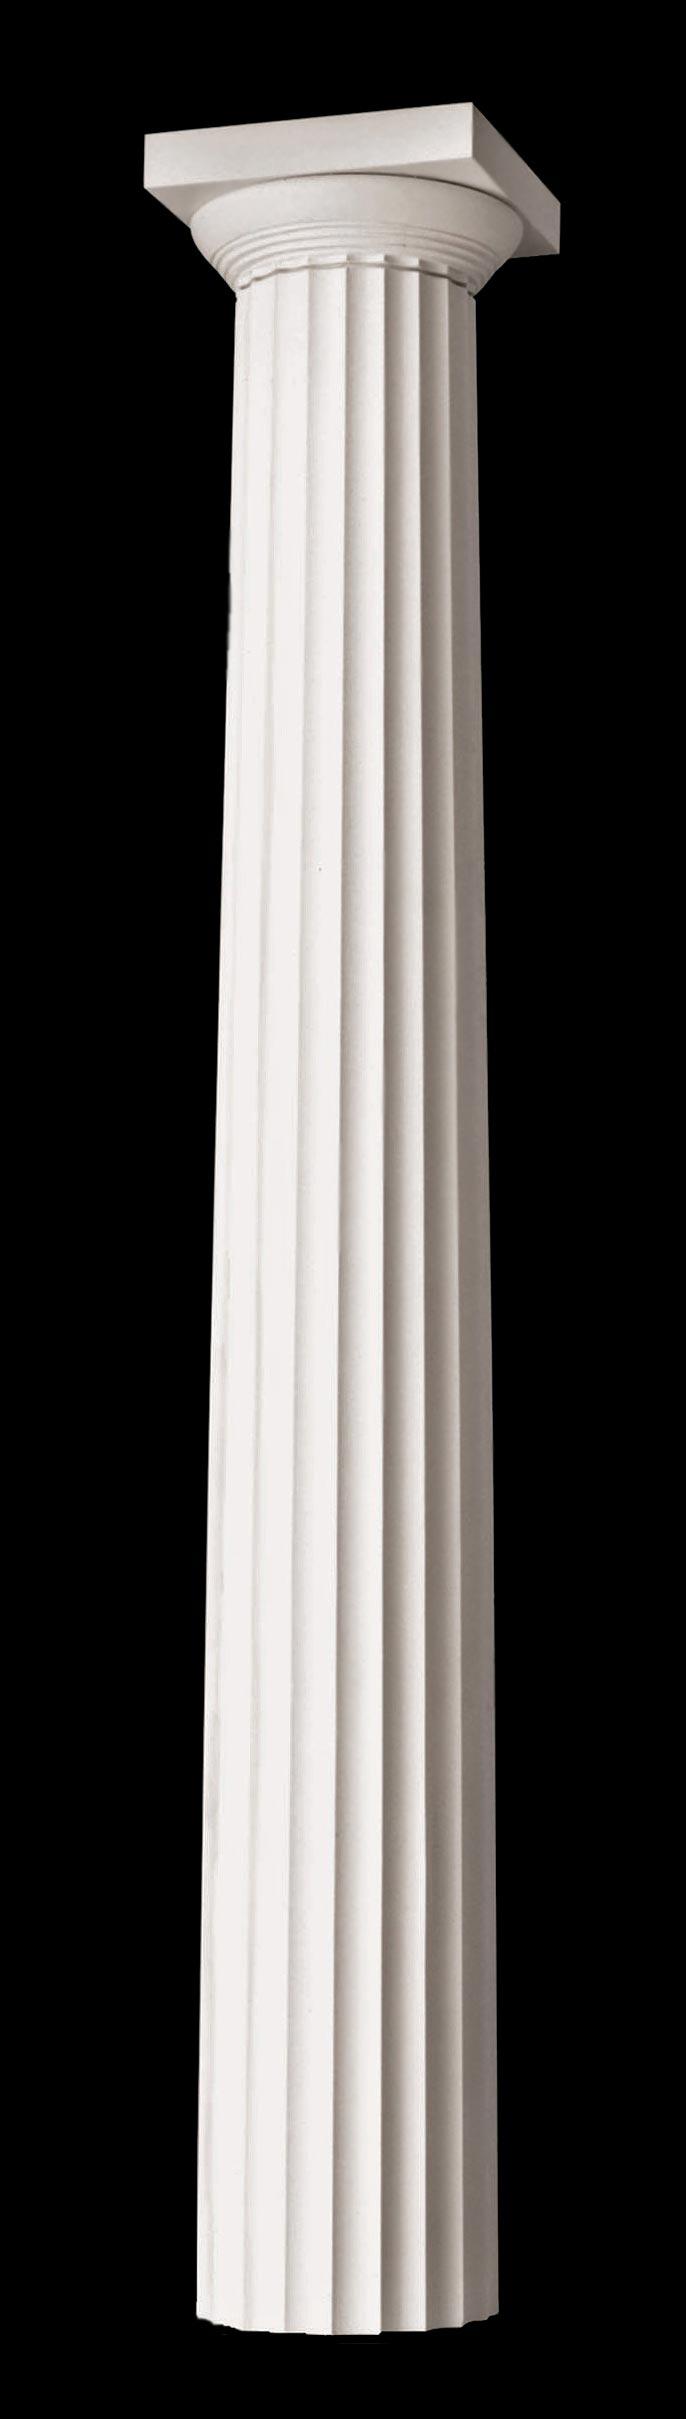 Fluted Architectural Greek Doric Wood Columns   CSI Code: 06440 |  Chadsworth Columns